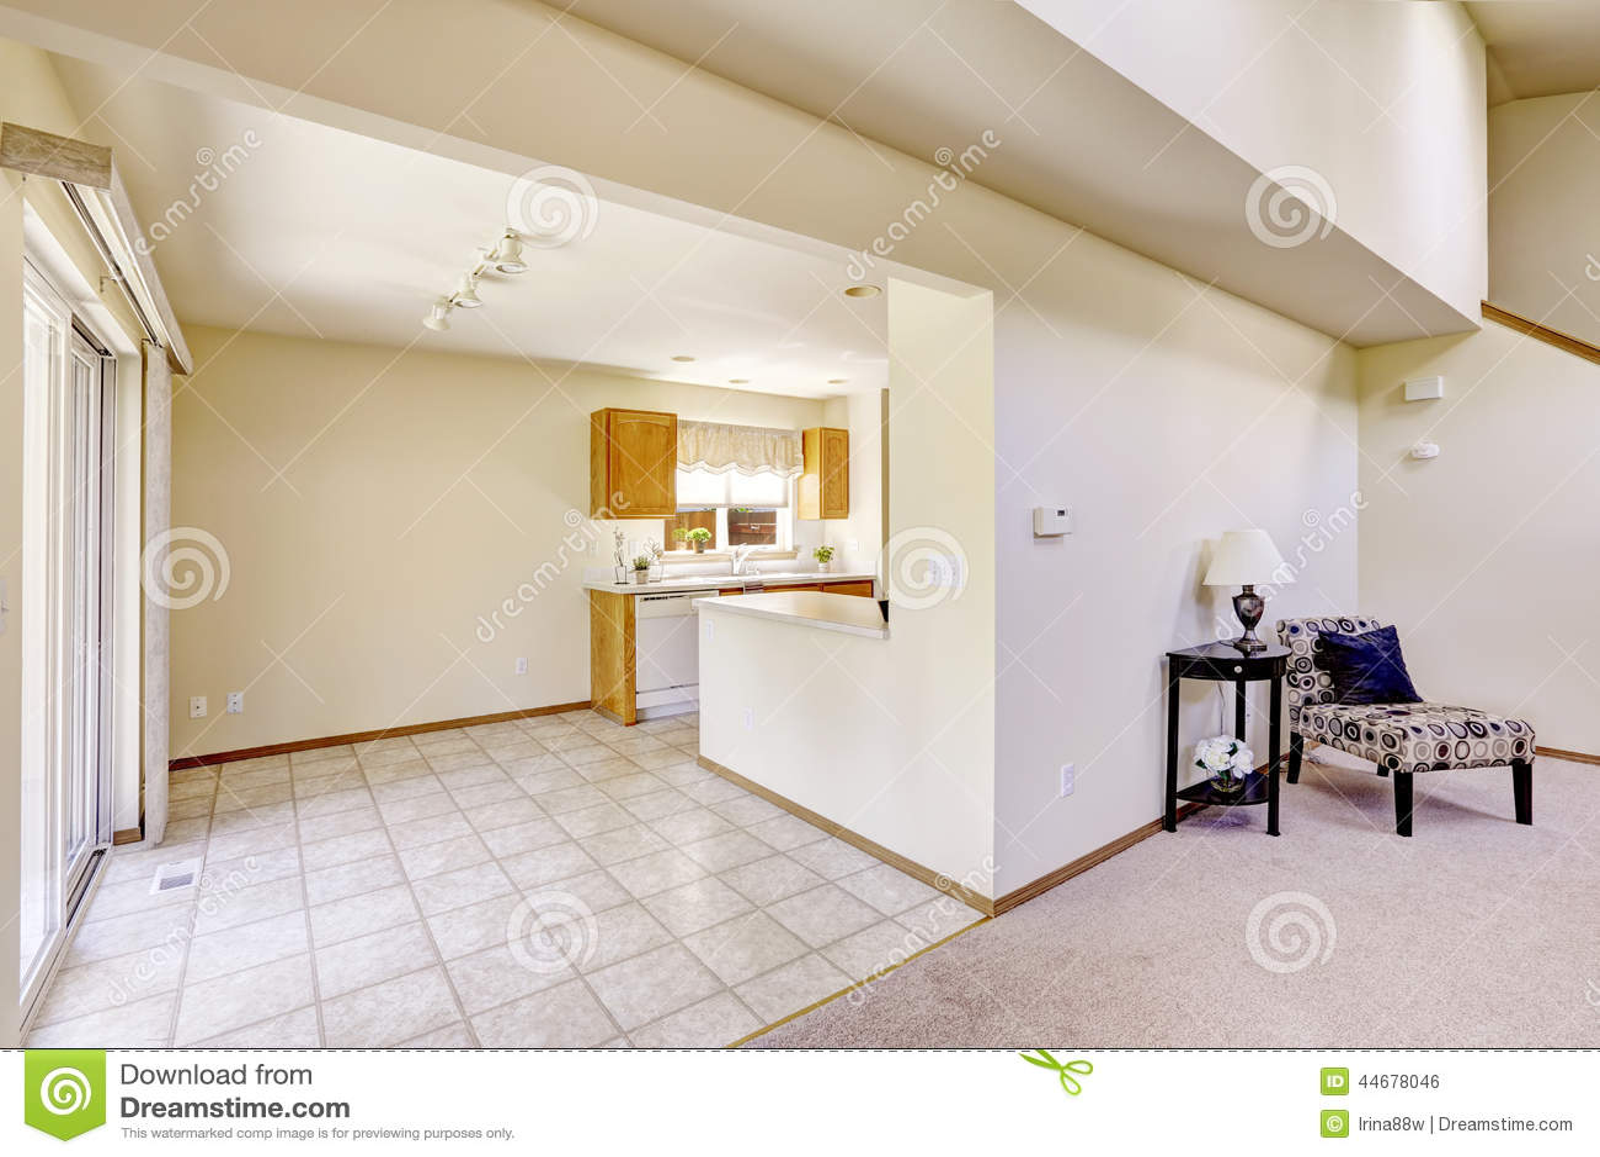 area rugs for kitchen counter chairs 明亮的房间在空的房子里与砖地的厨房地区库存照片 图片包括有建筑 改造 明亮的房间在空的房子里与砖地的厨房地区